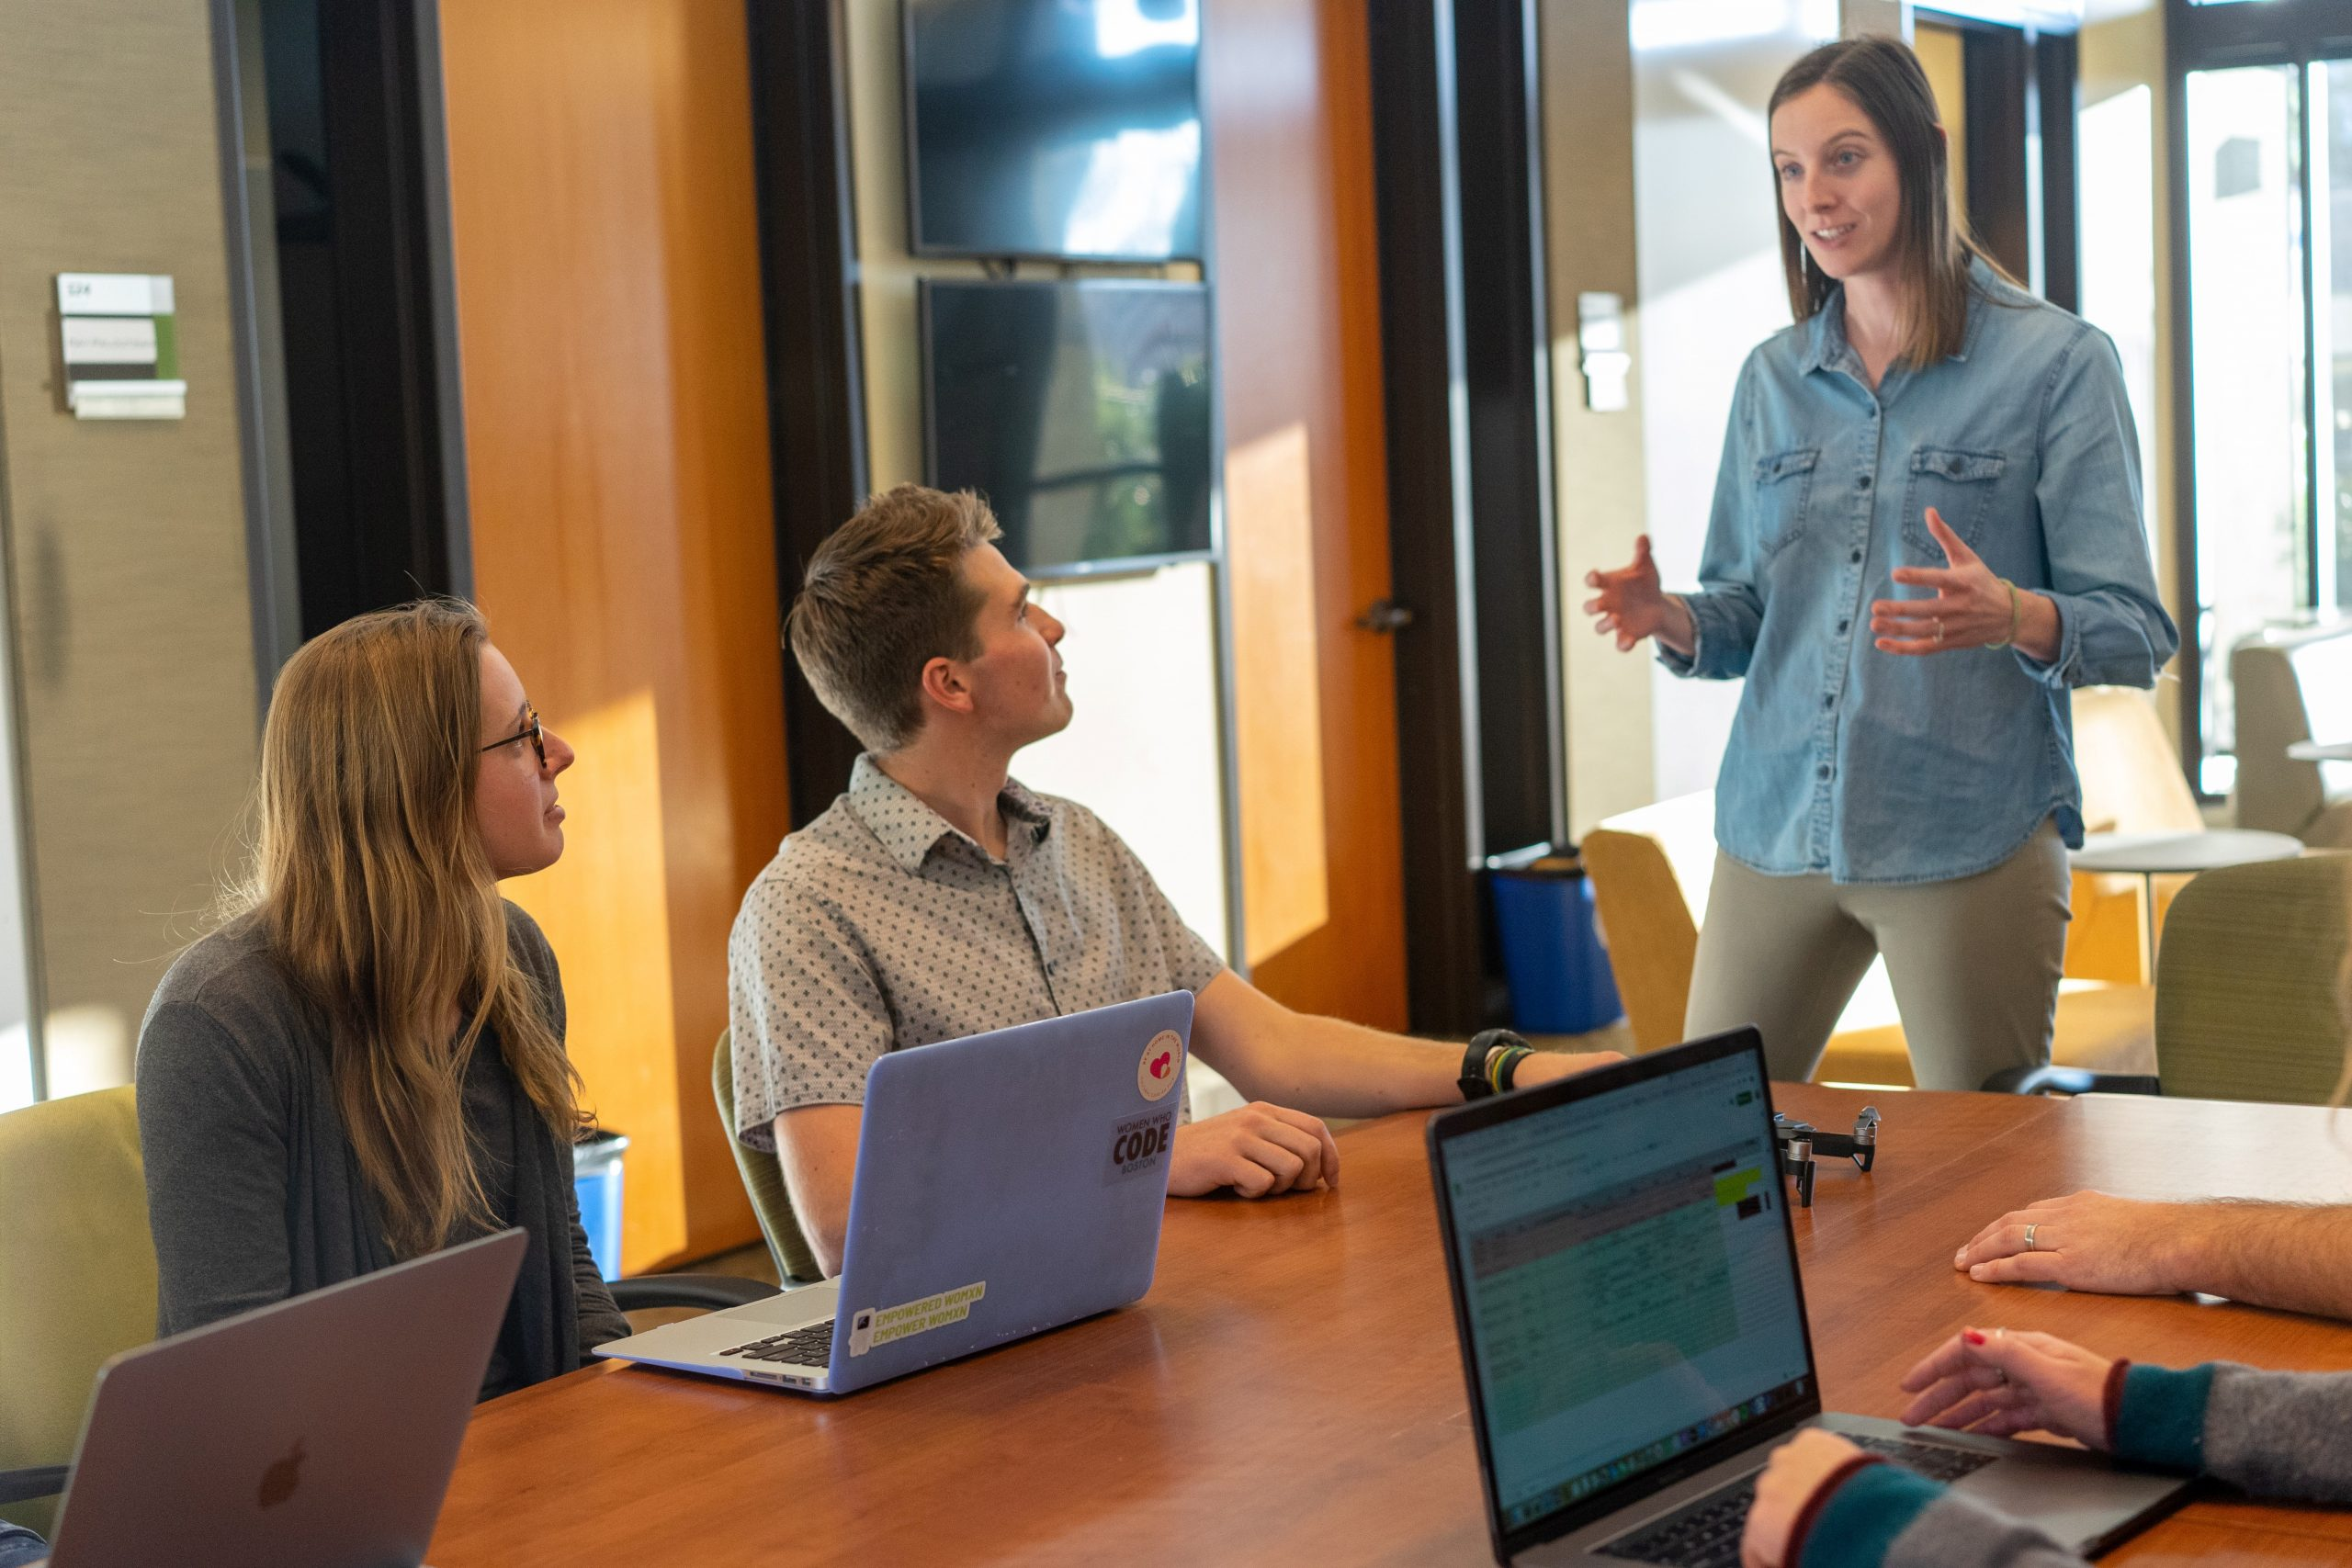 Tech business meeting being held in an office between three staff members